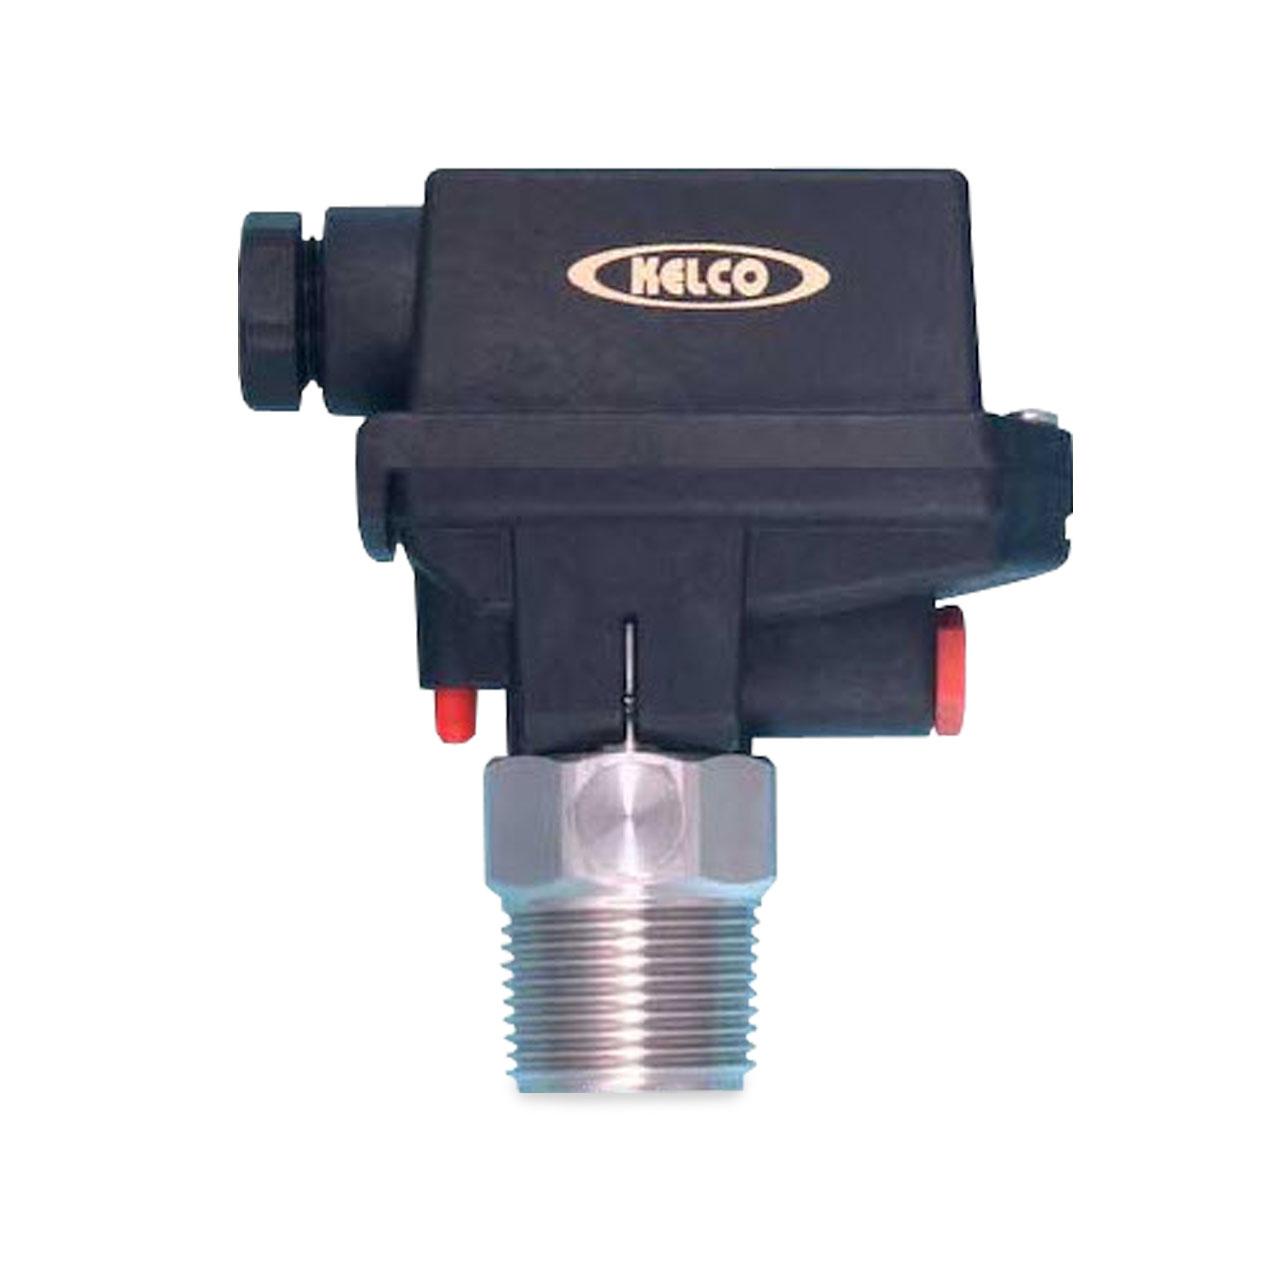 Inline Float Switch : Kelco f series inline flow switch fec